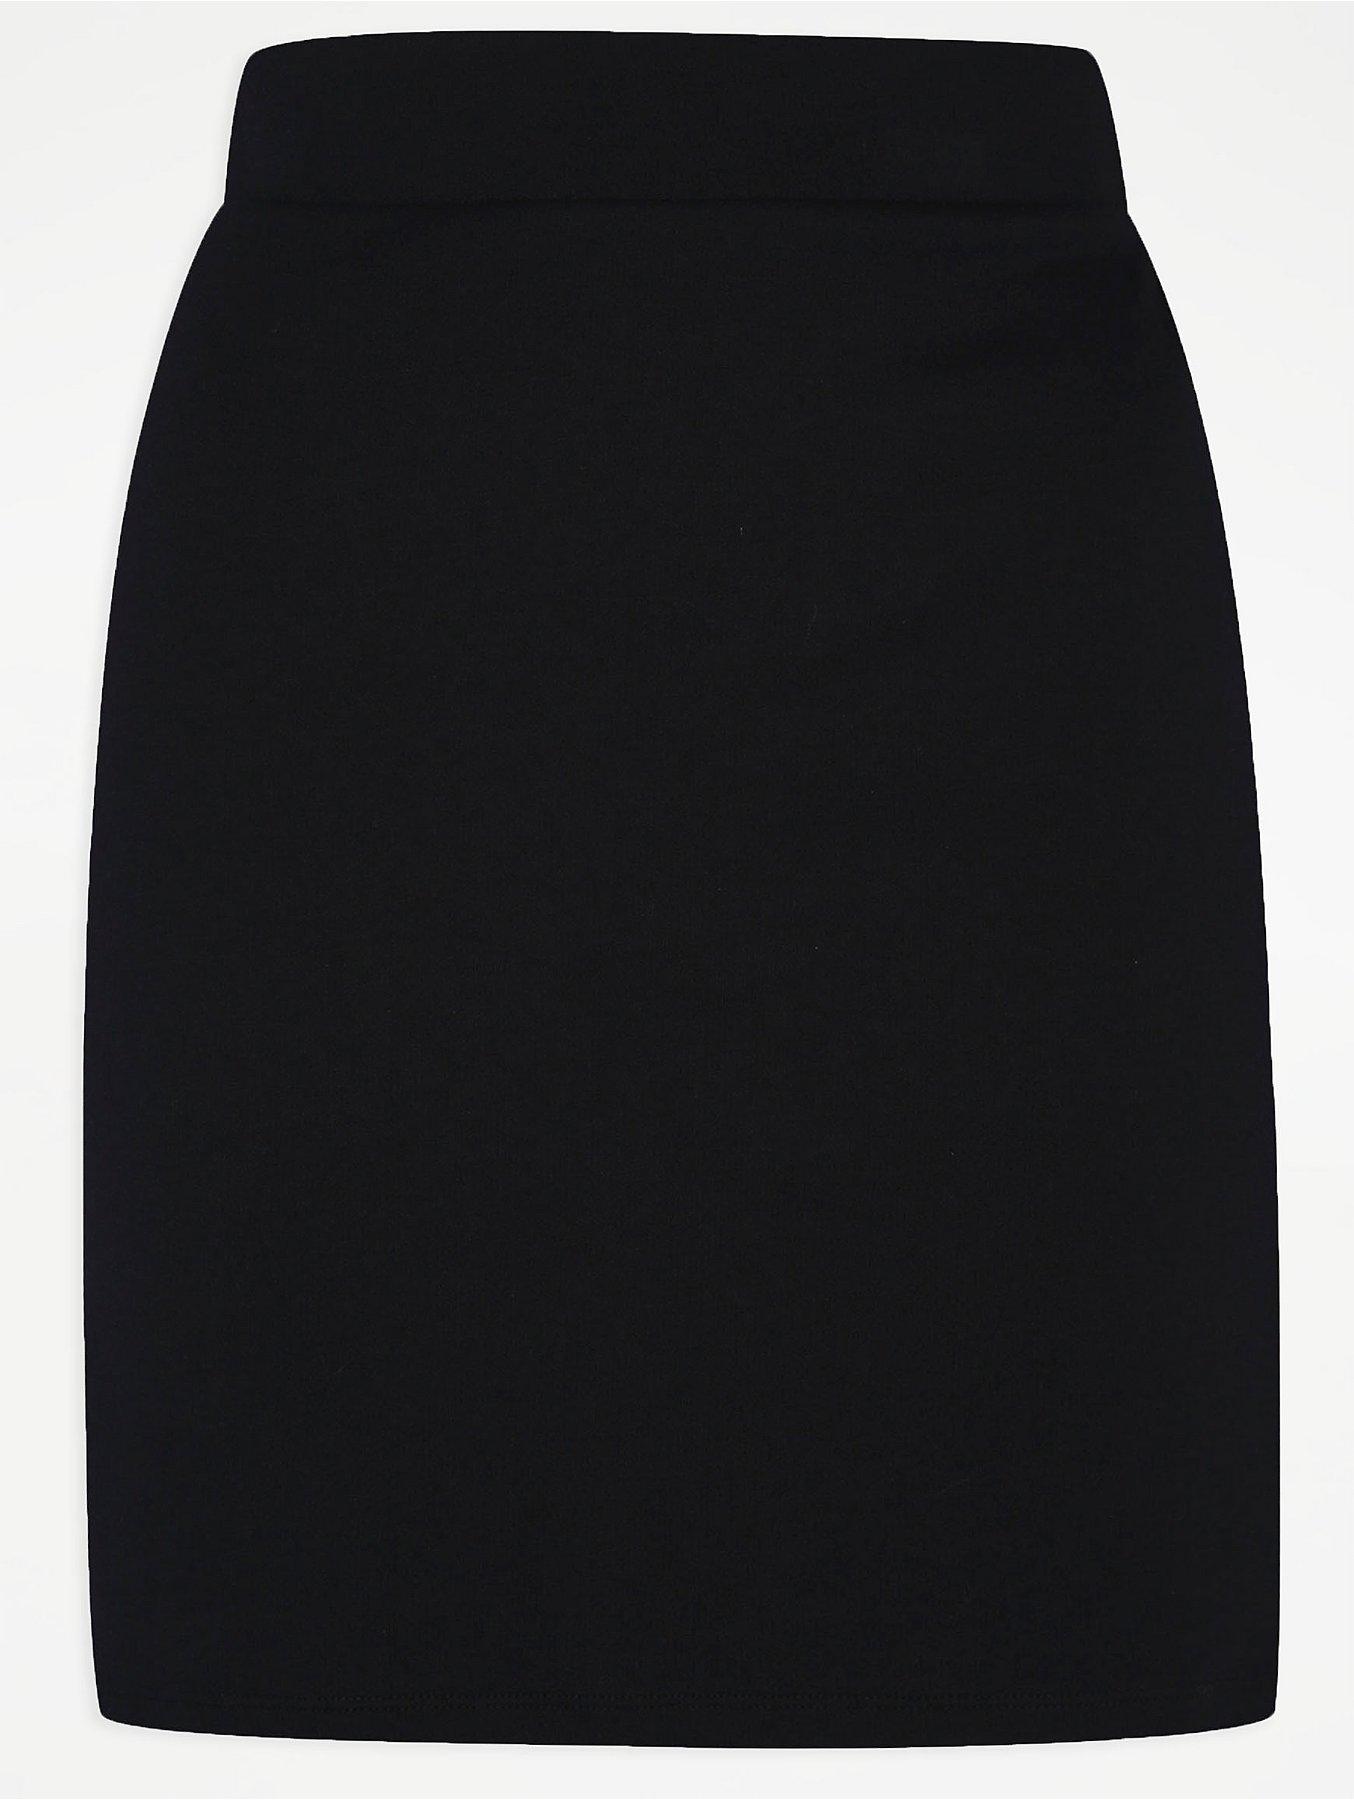 065378d85c7cd Ladies Skirts Asda